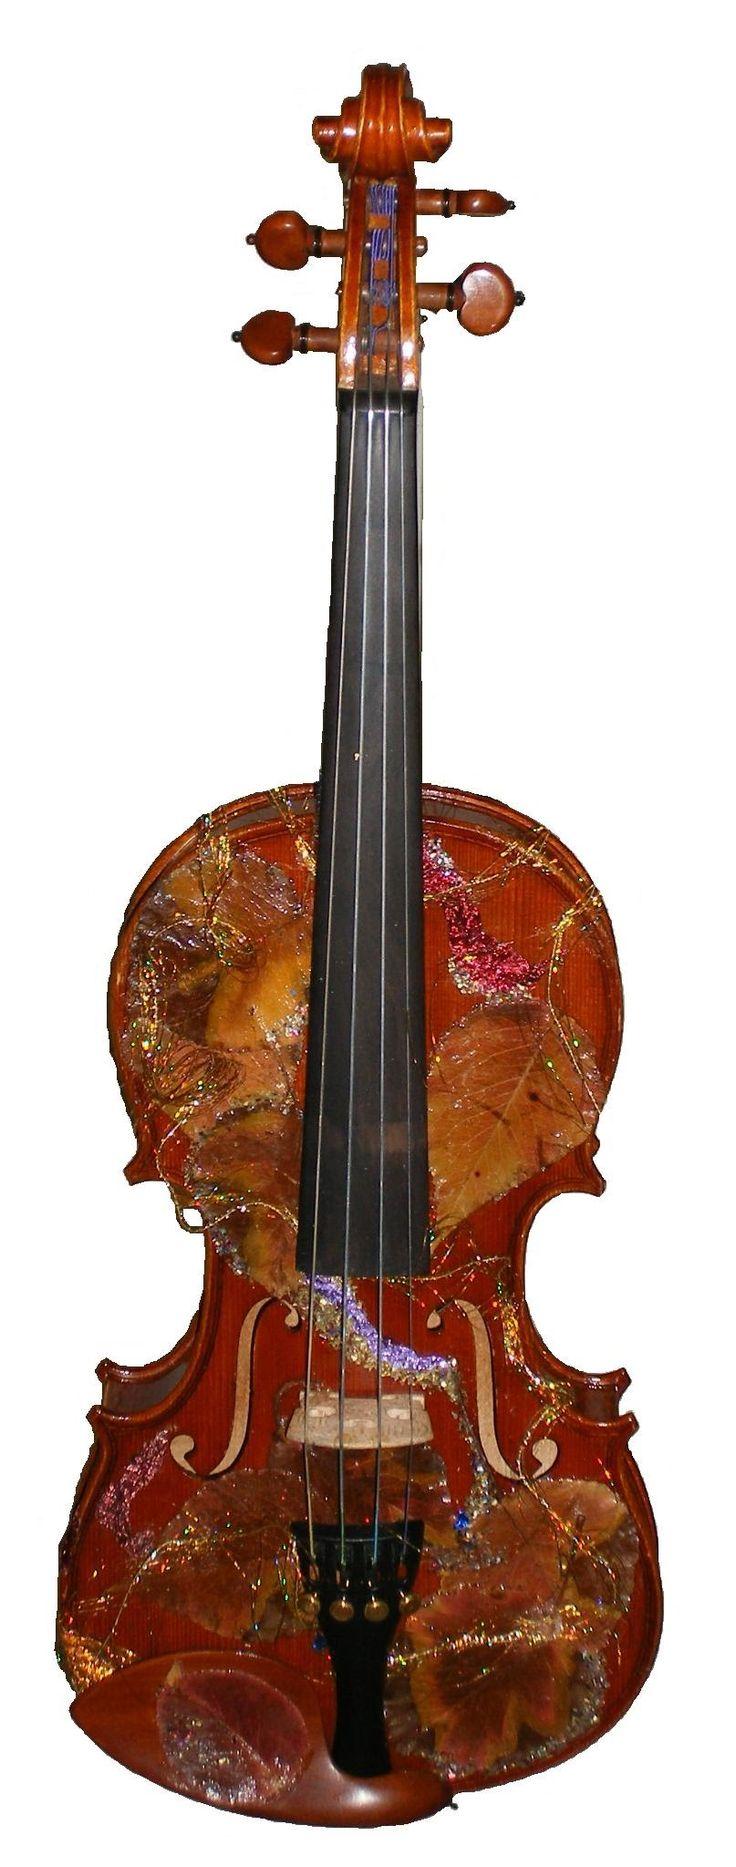 Old wood minerale interior of violin - Violin